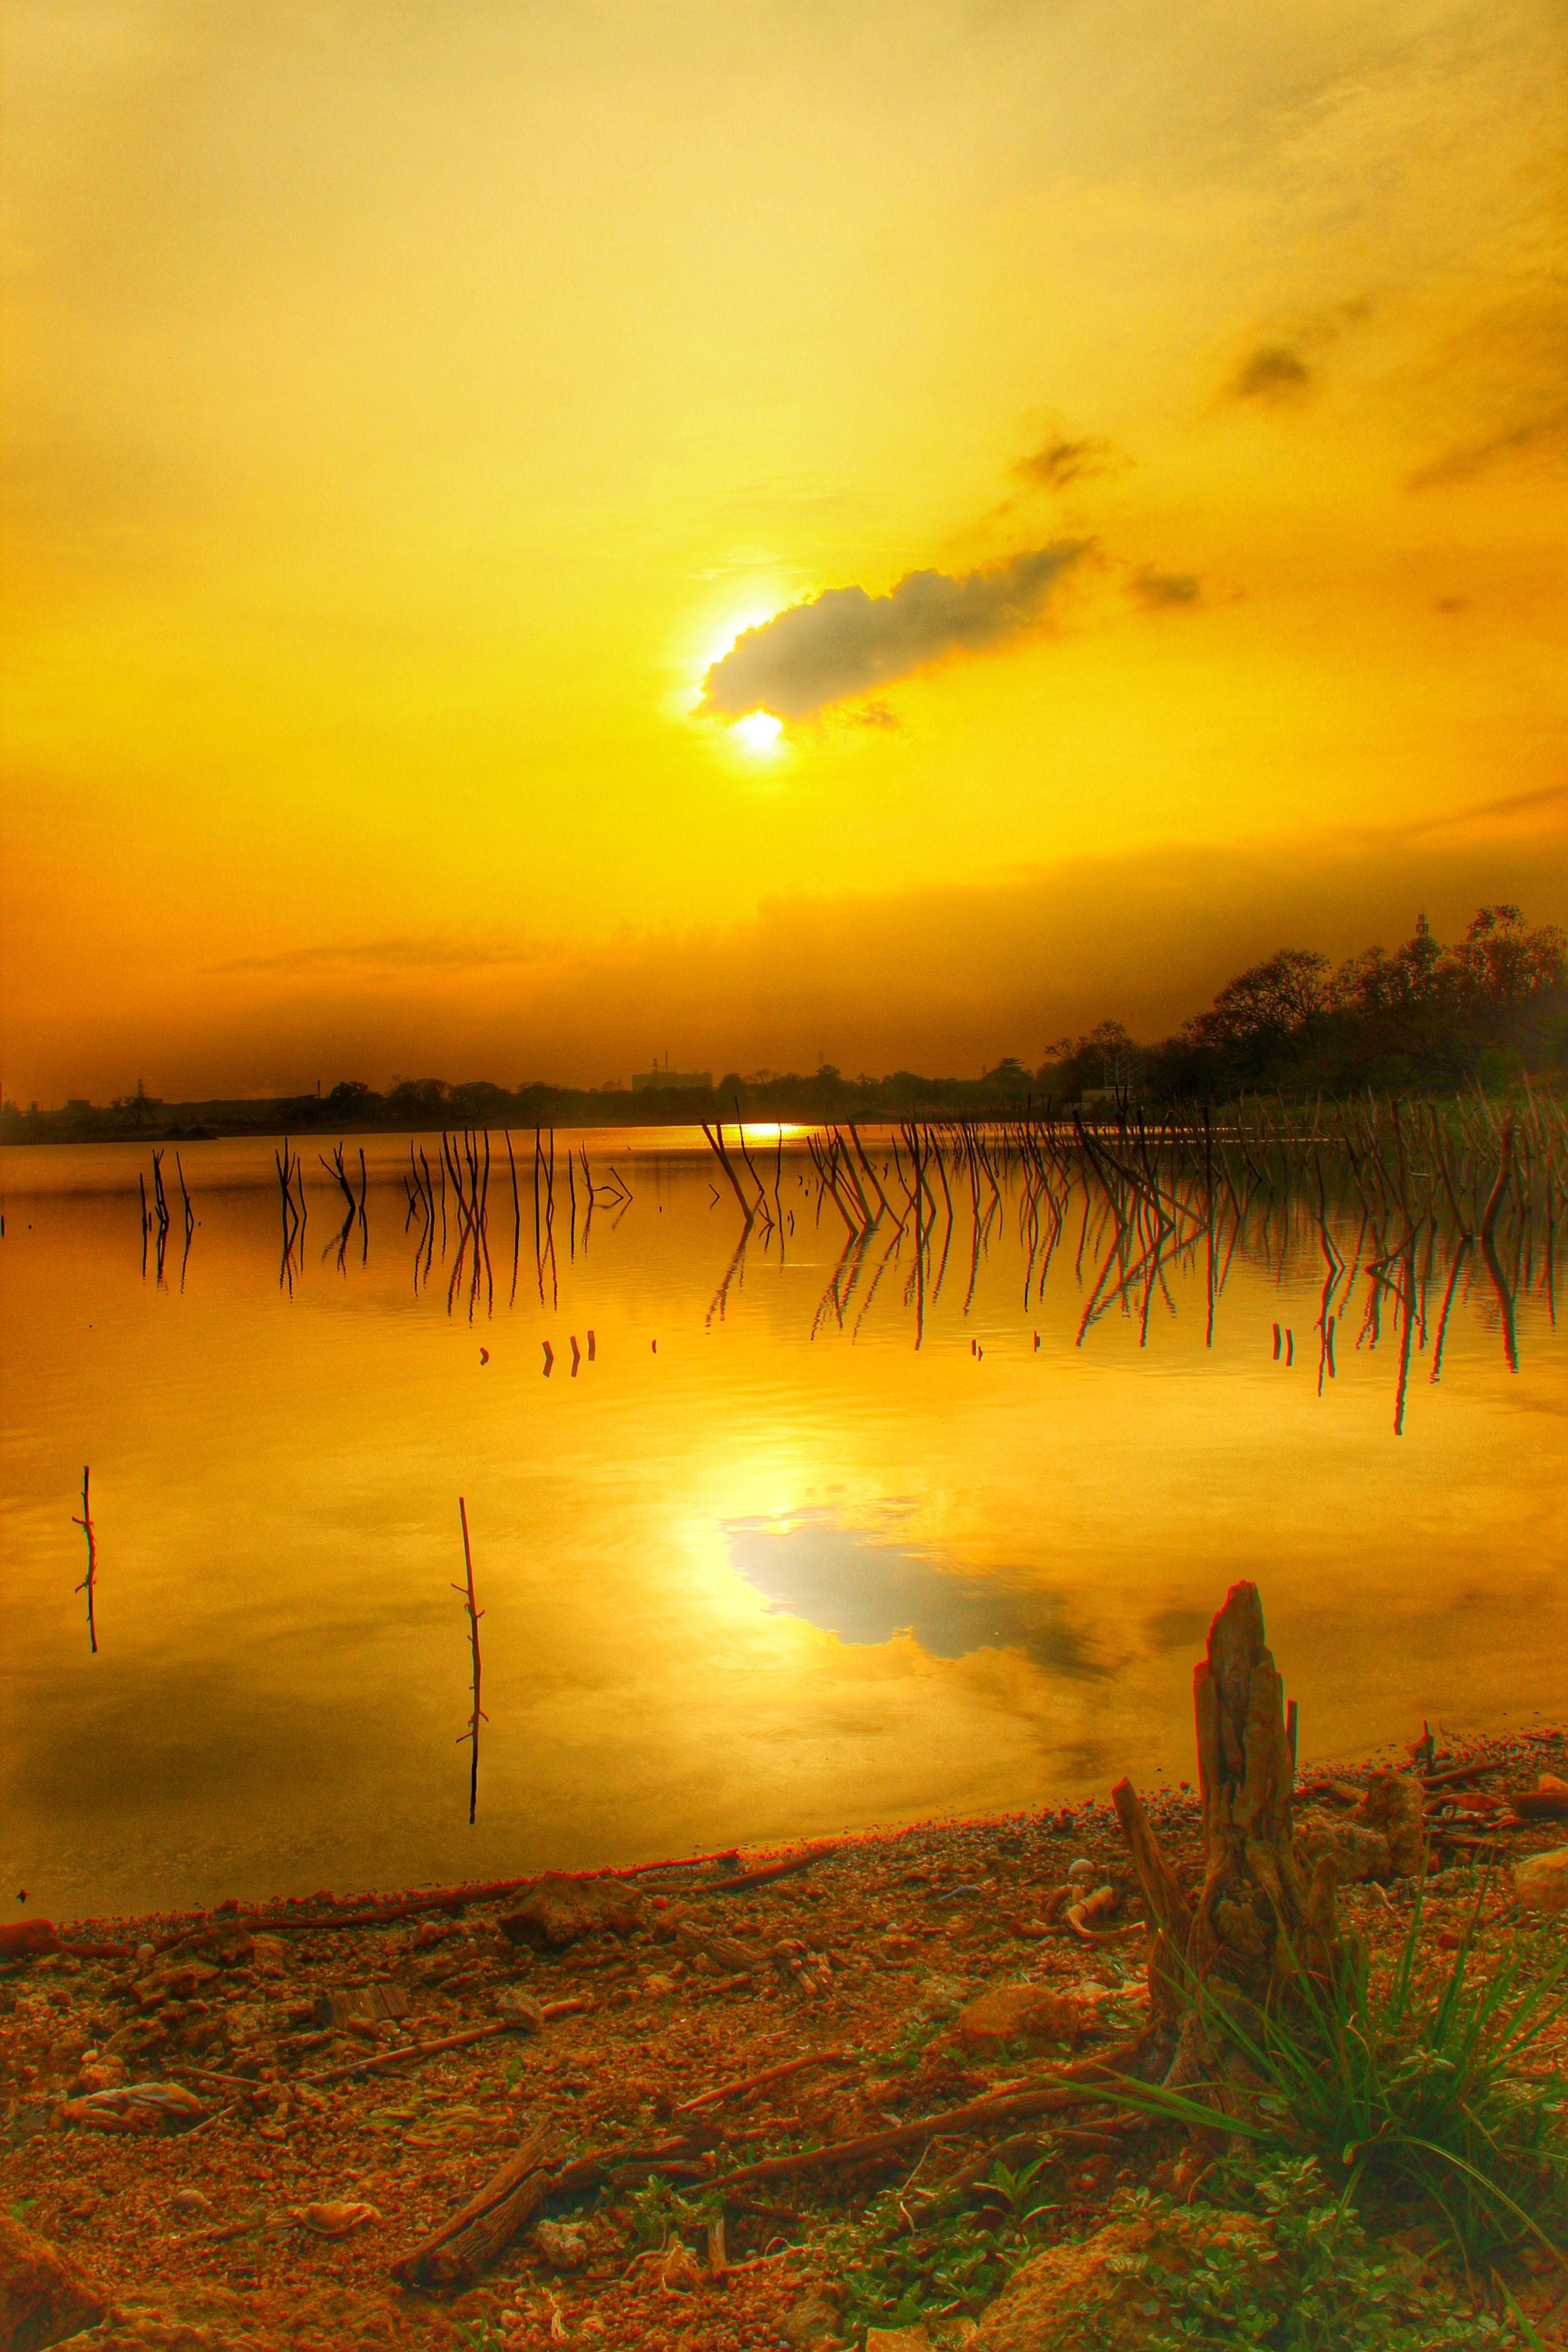 sunset, orange color, water, scenics, tranquil scene, tranquility, beauty in nature, sky, sun, sea, idyllic, nature, silhouette, reflection, beach, lake, cloud - sky, horizon over water, remote, non-urban scene